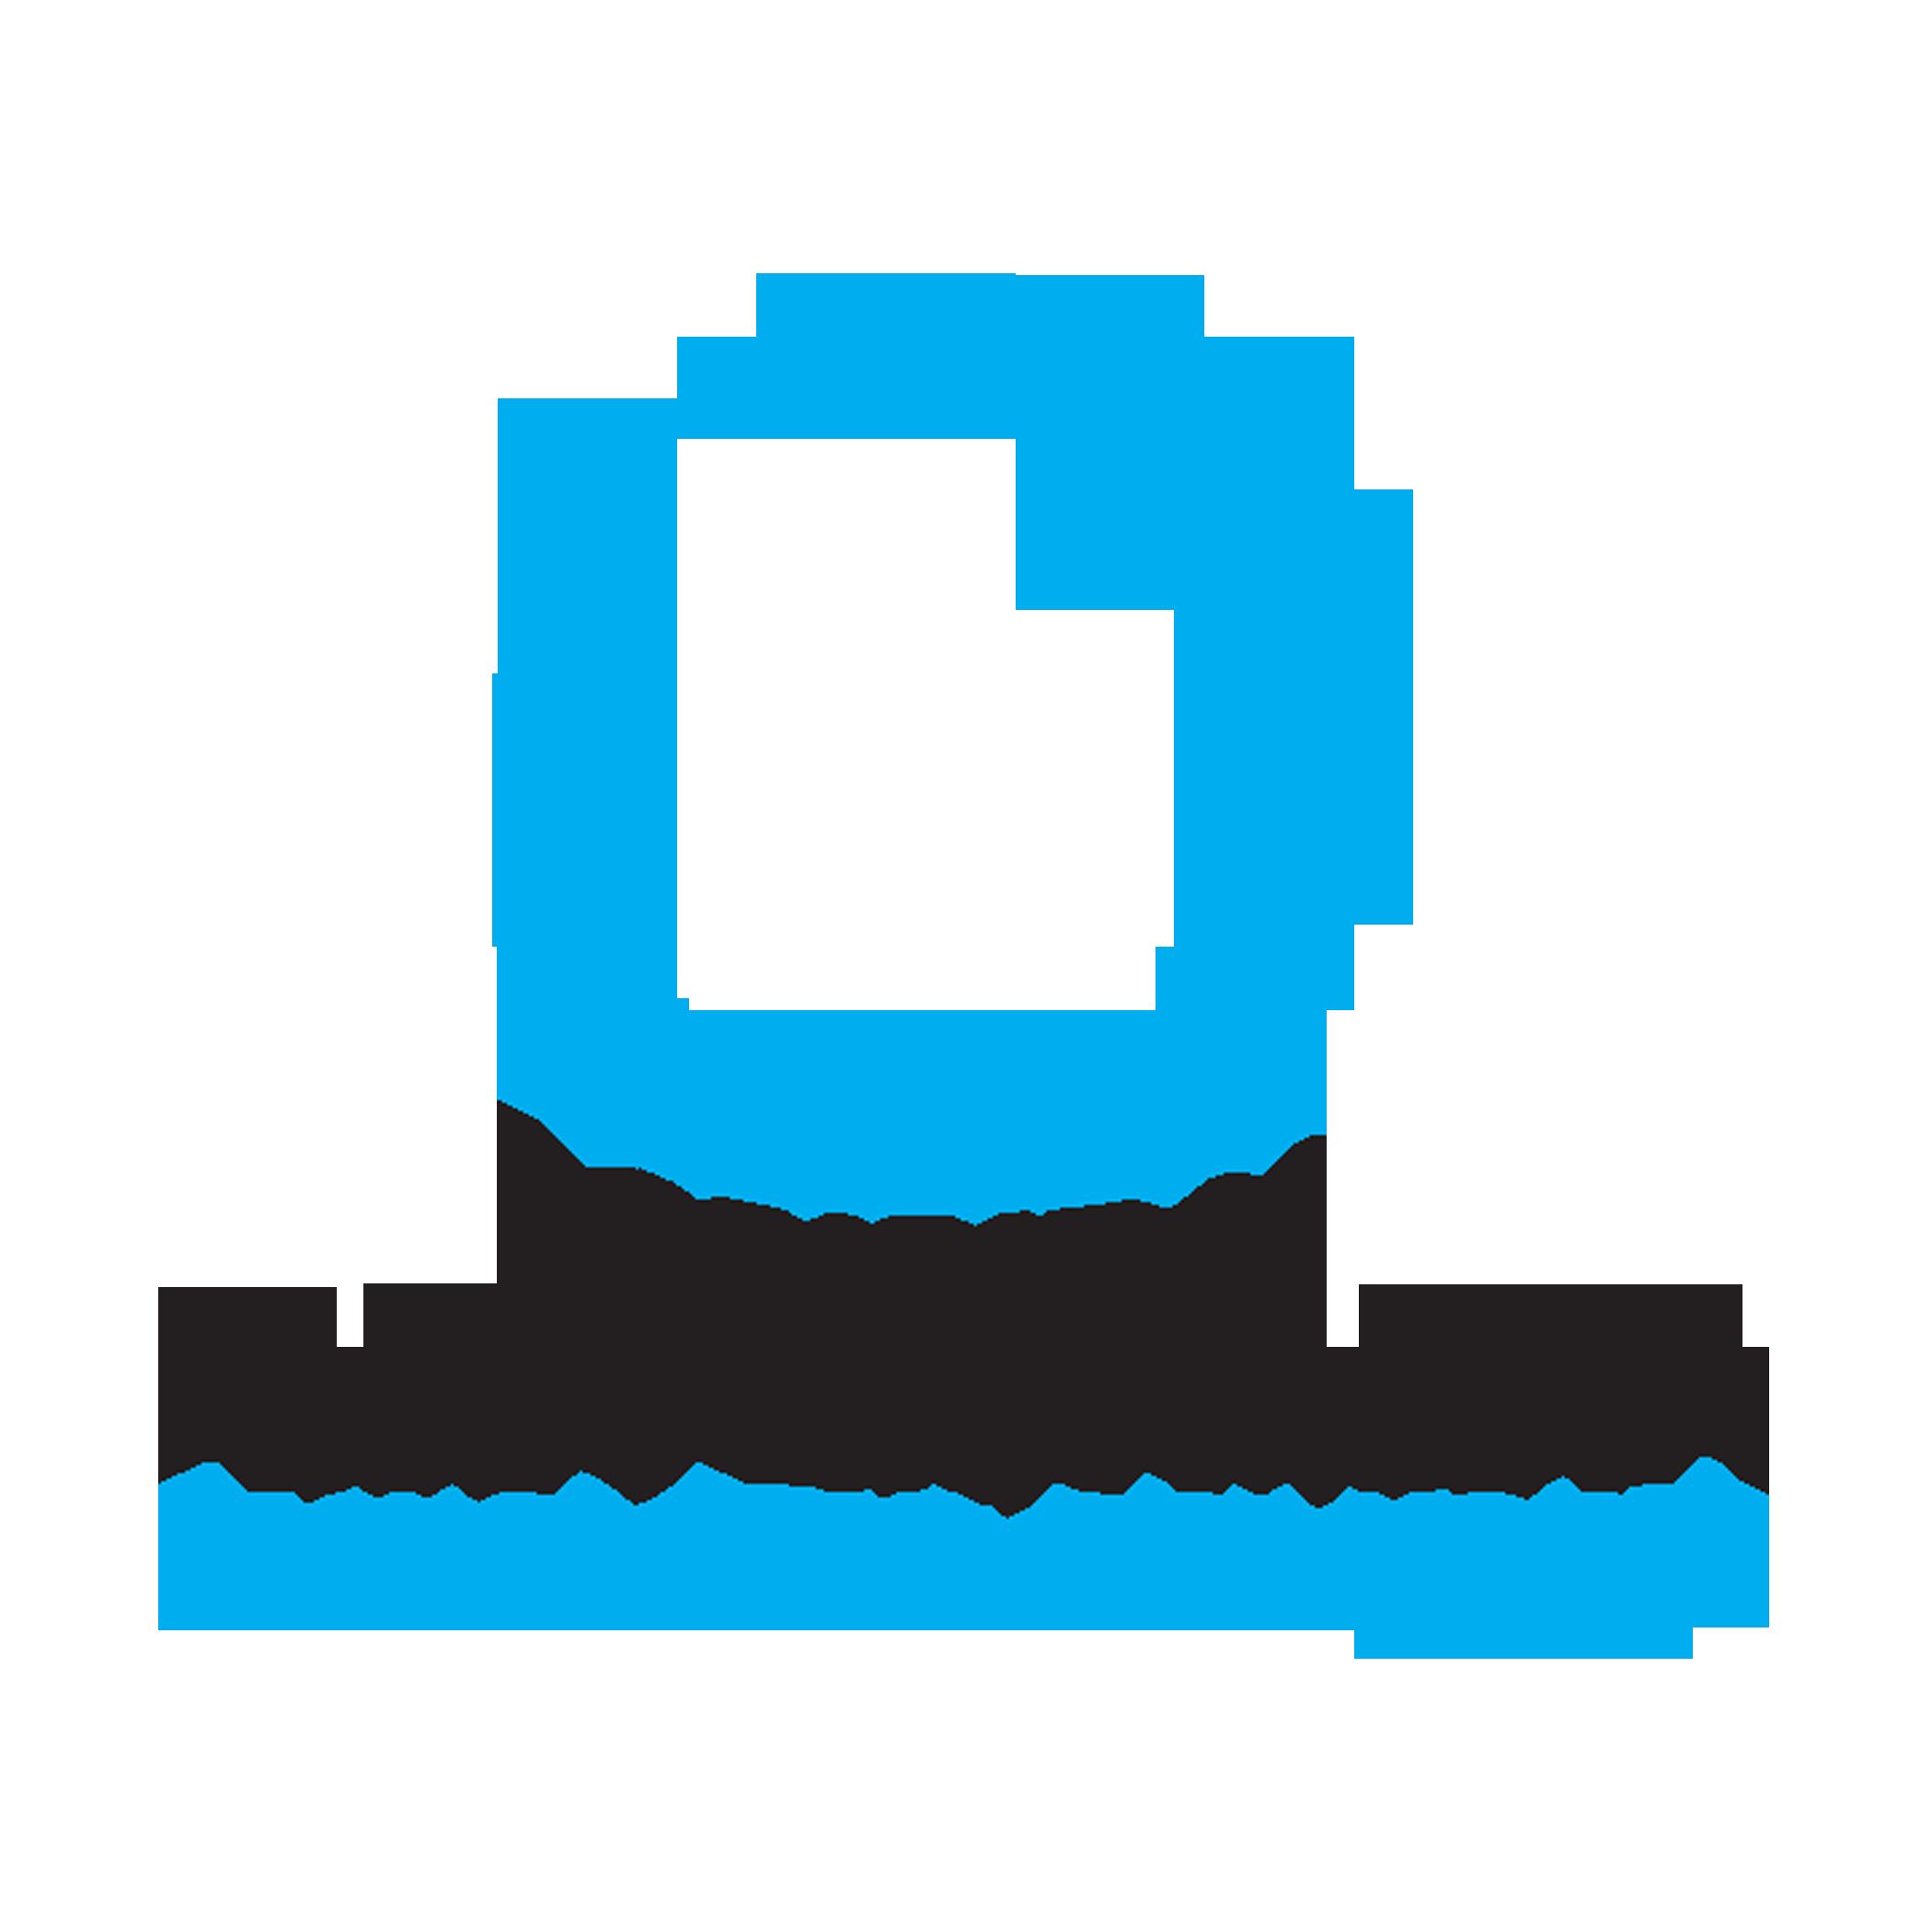 http://www.freespiritmedia.org